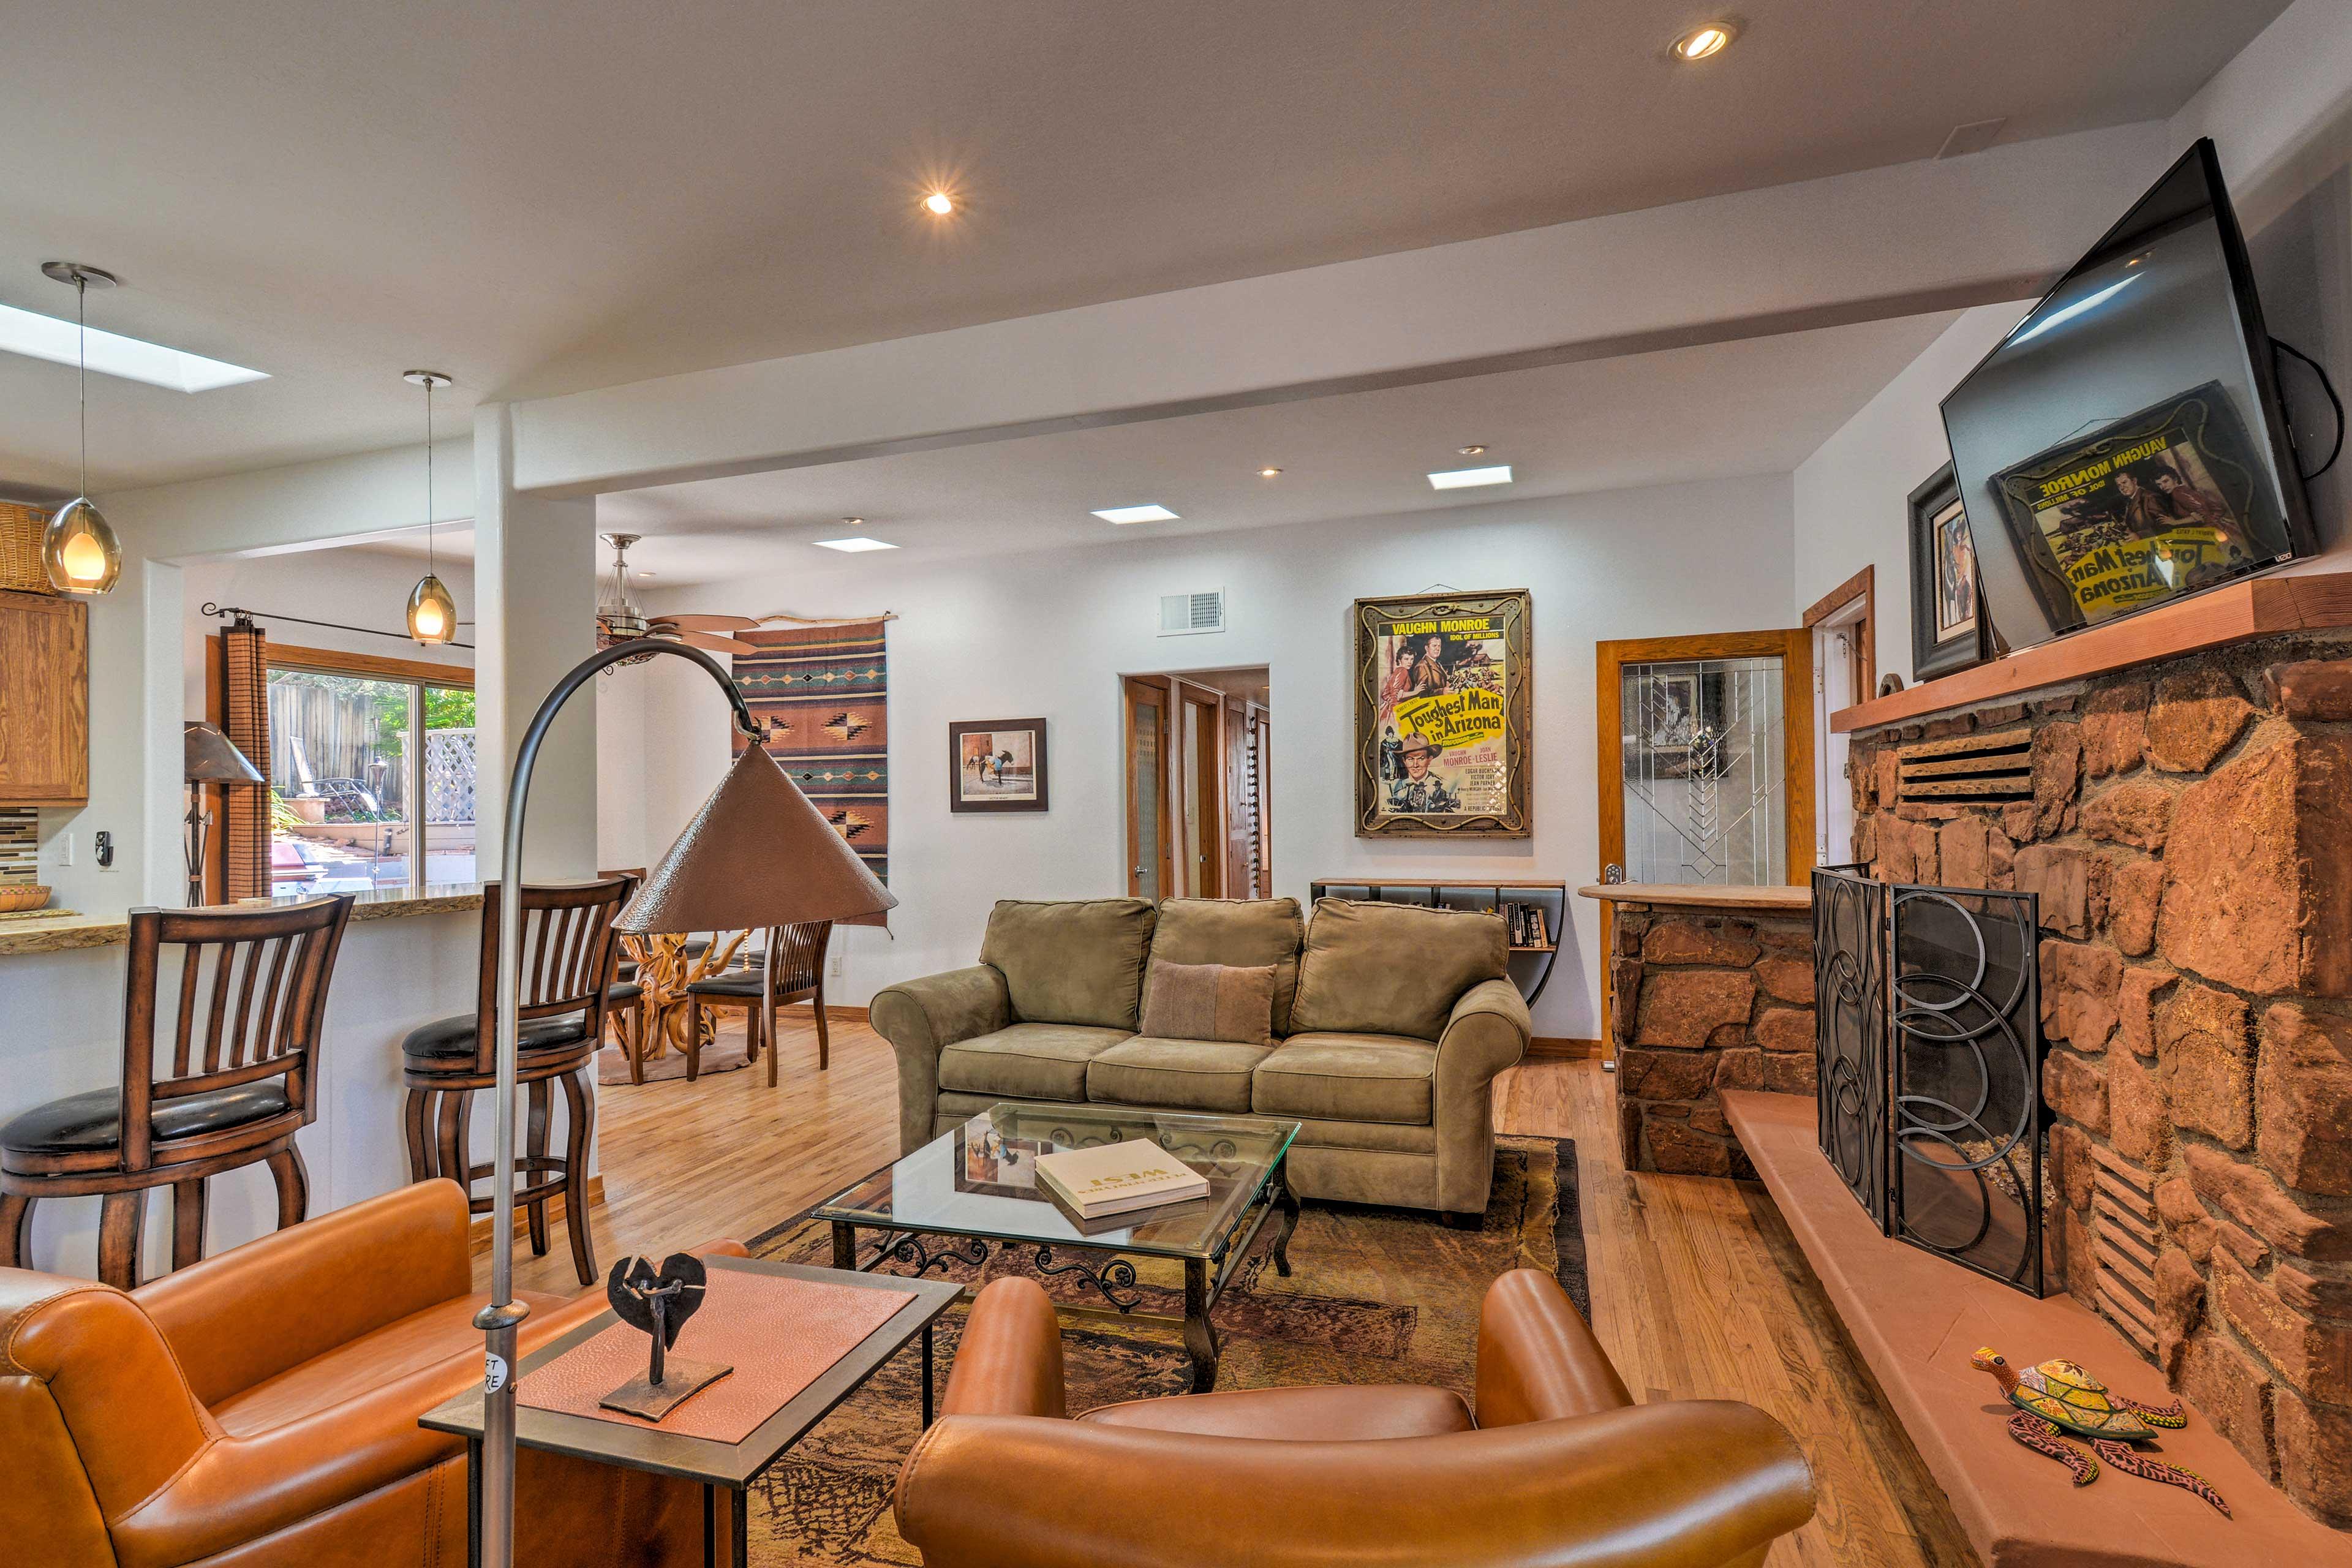 Living Room | Gas Fireplace | Southwestern Decor | Netflix & HBO